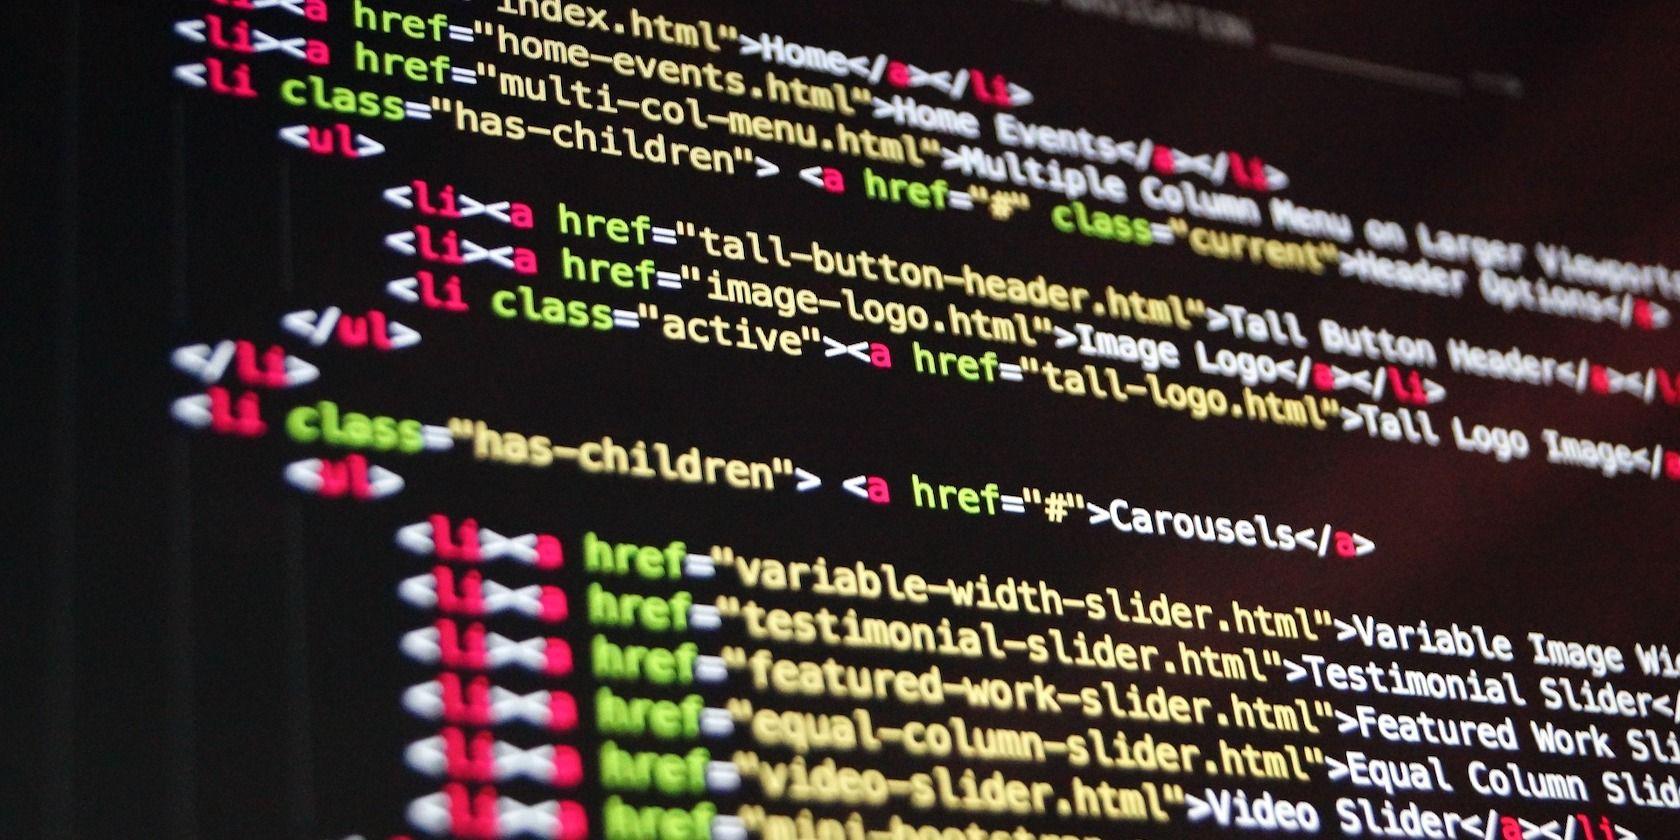 A screenshot of HTML code